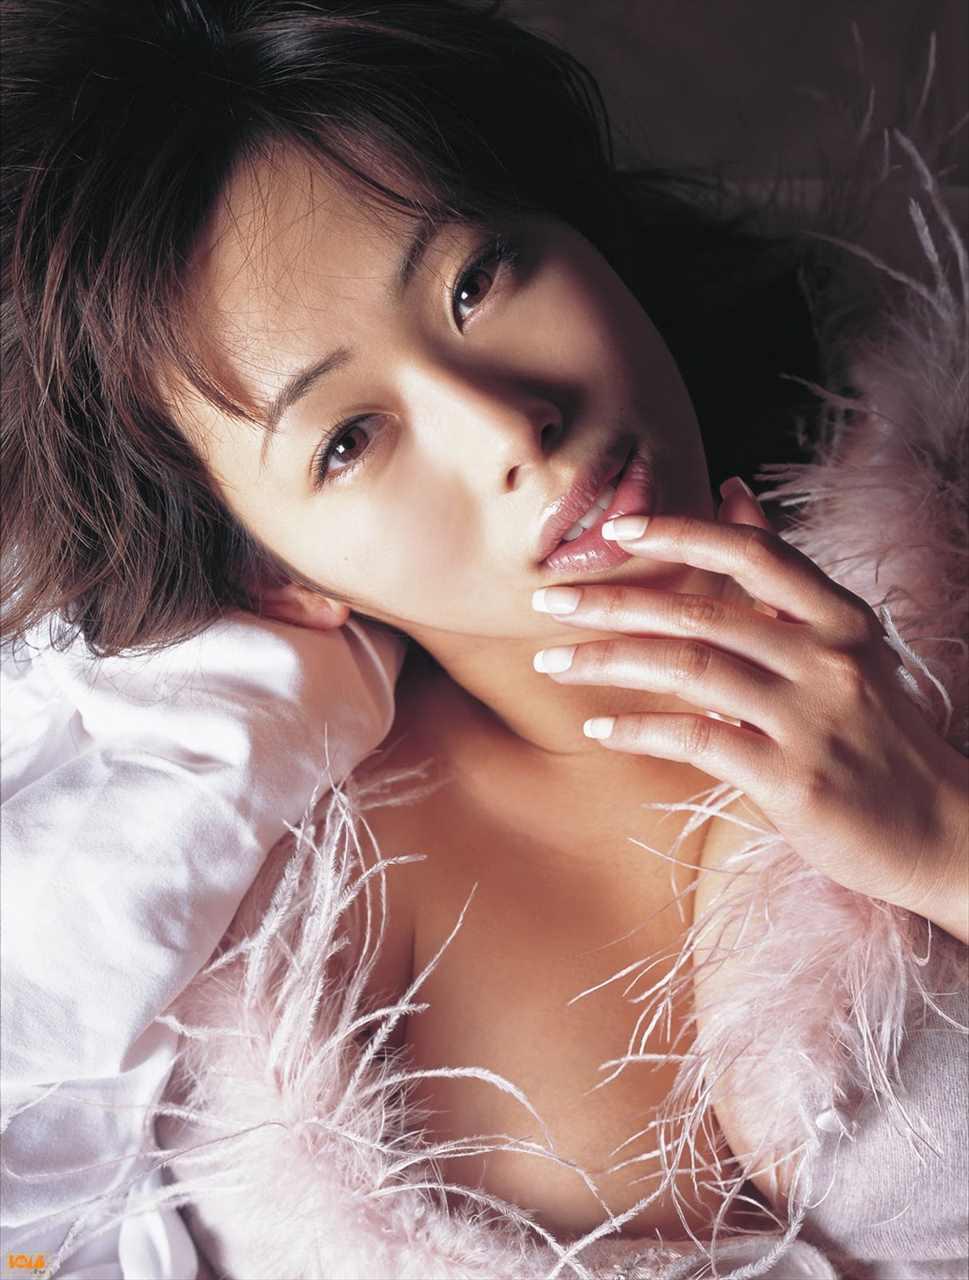 Inoue Waka 井上和香